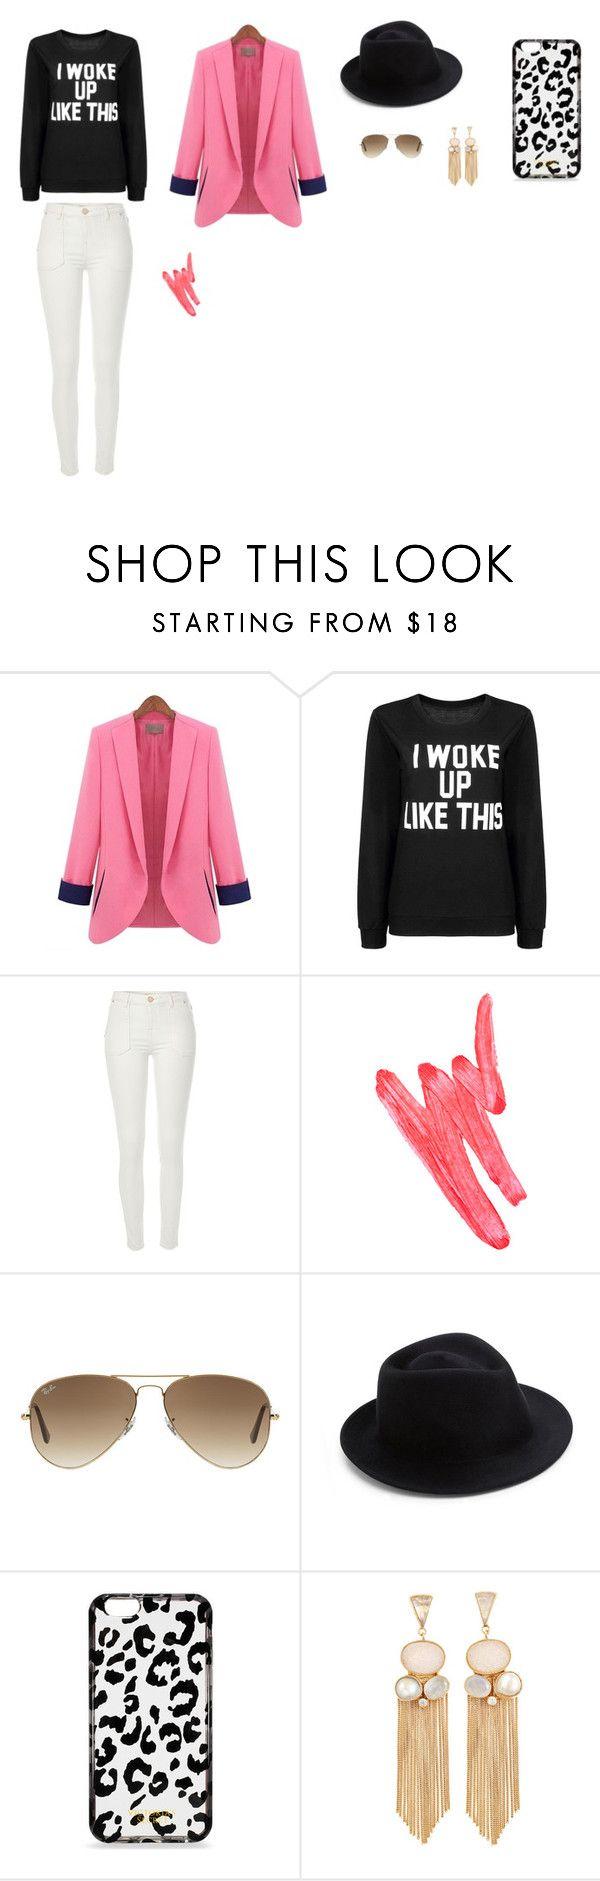 """pink i woke up"" by nattavr on Polyvore featuring moda, River Island, Ilia, Ray-Ban, Eugenia Kim y Victoria's Secret"